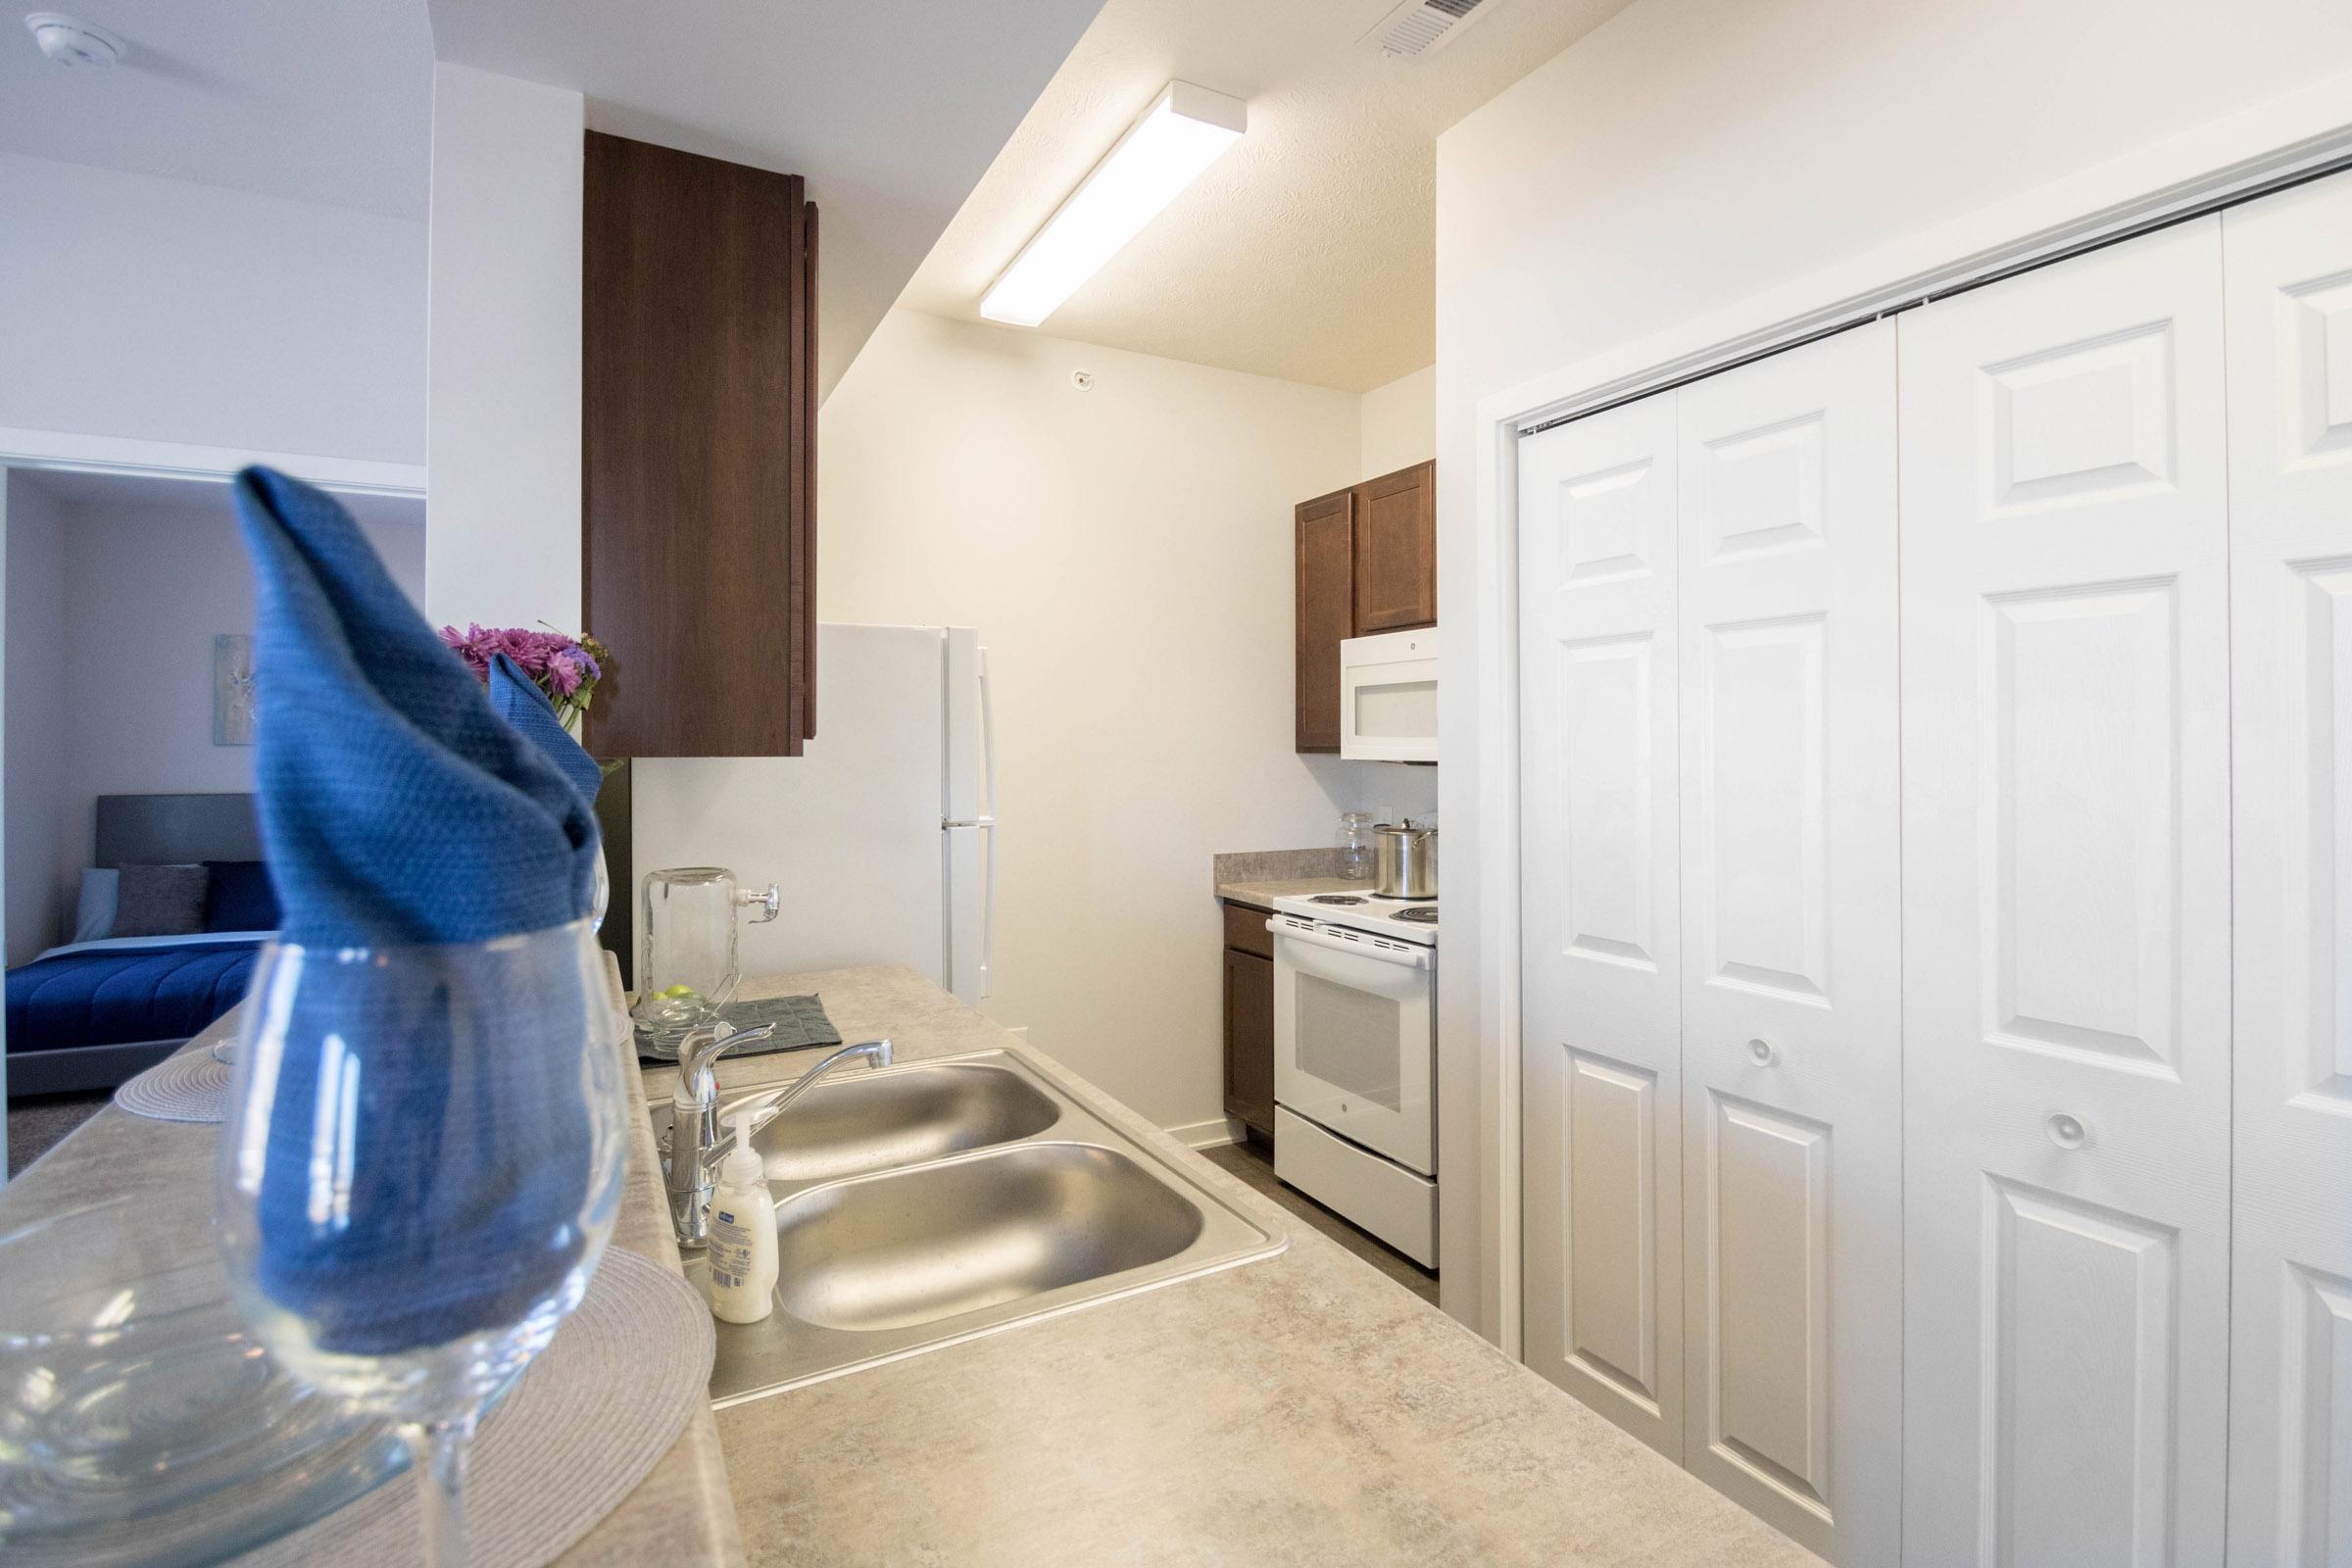 Modern Kitchen at Aspen Grove Apartments in Omaha, NE